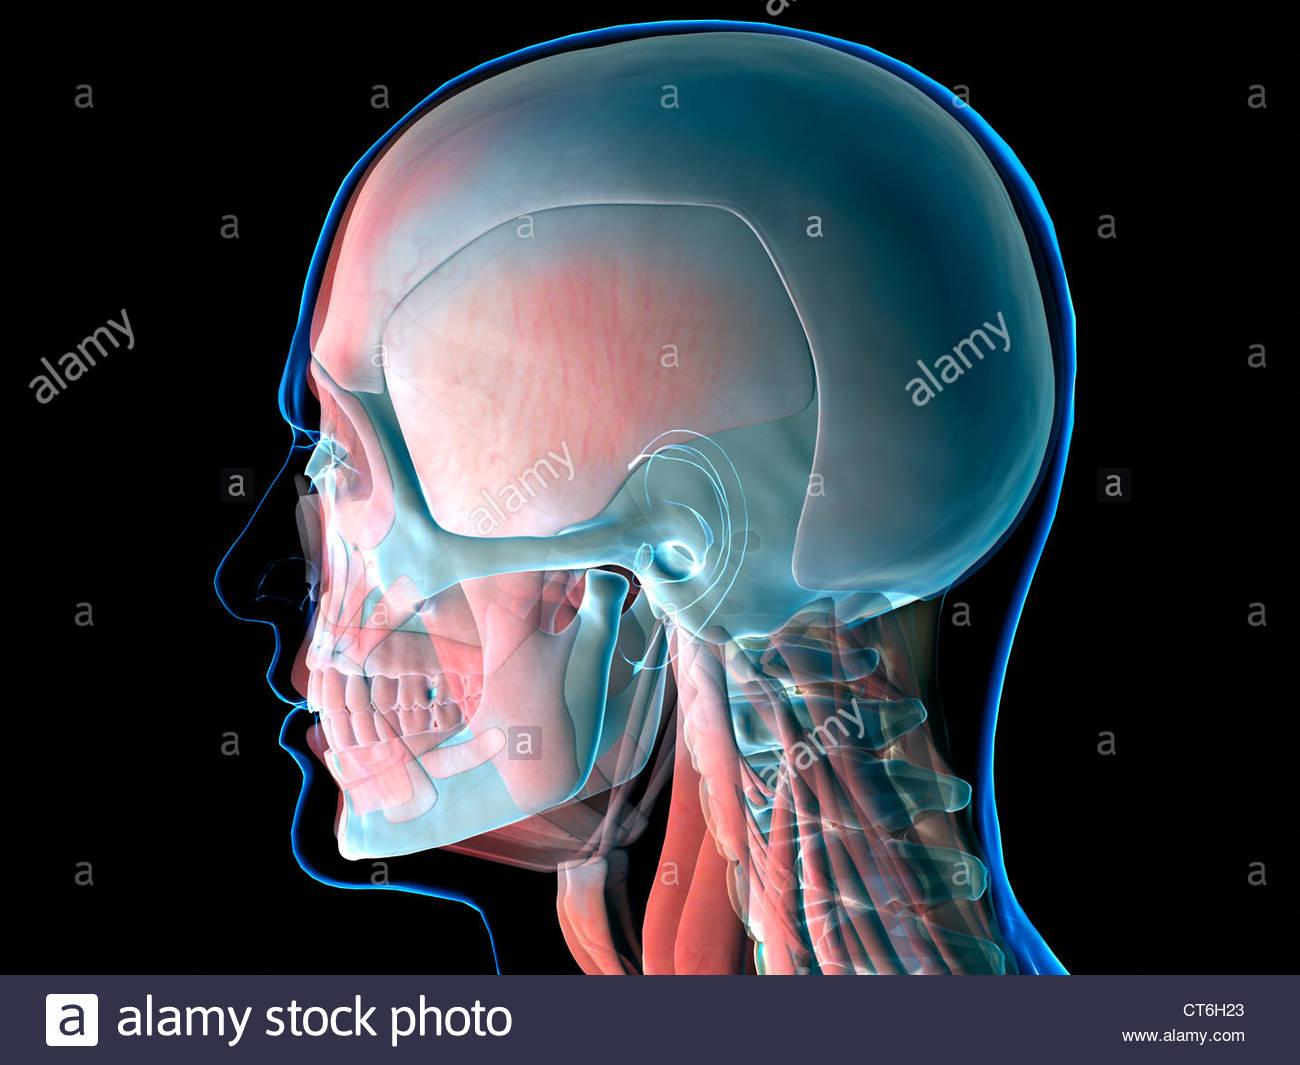 Normal Neck Bones Stock Photos & Normal Neck Bones Stock Images - Alamy